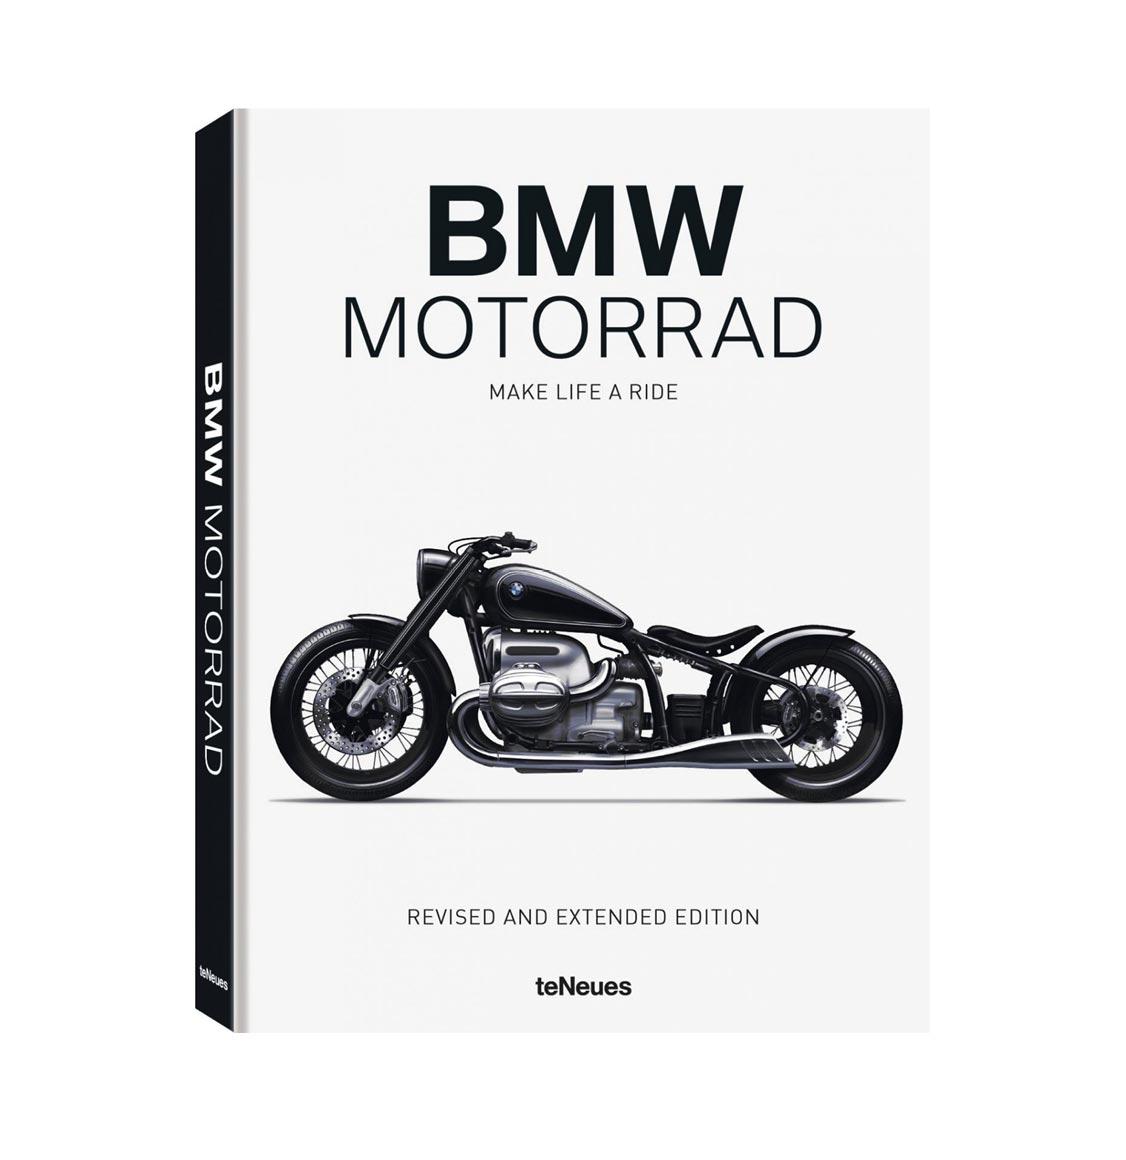 TeNeues BMW Motorrad